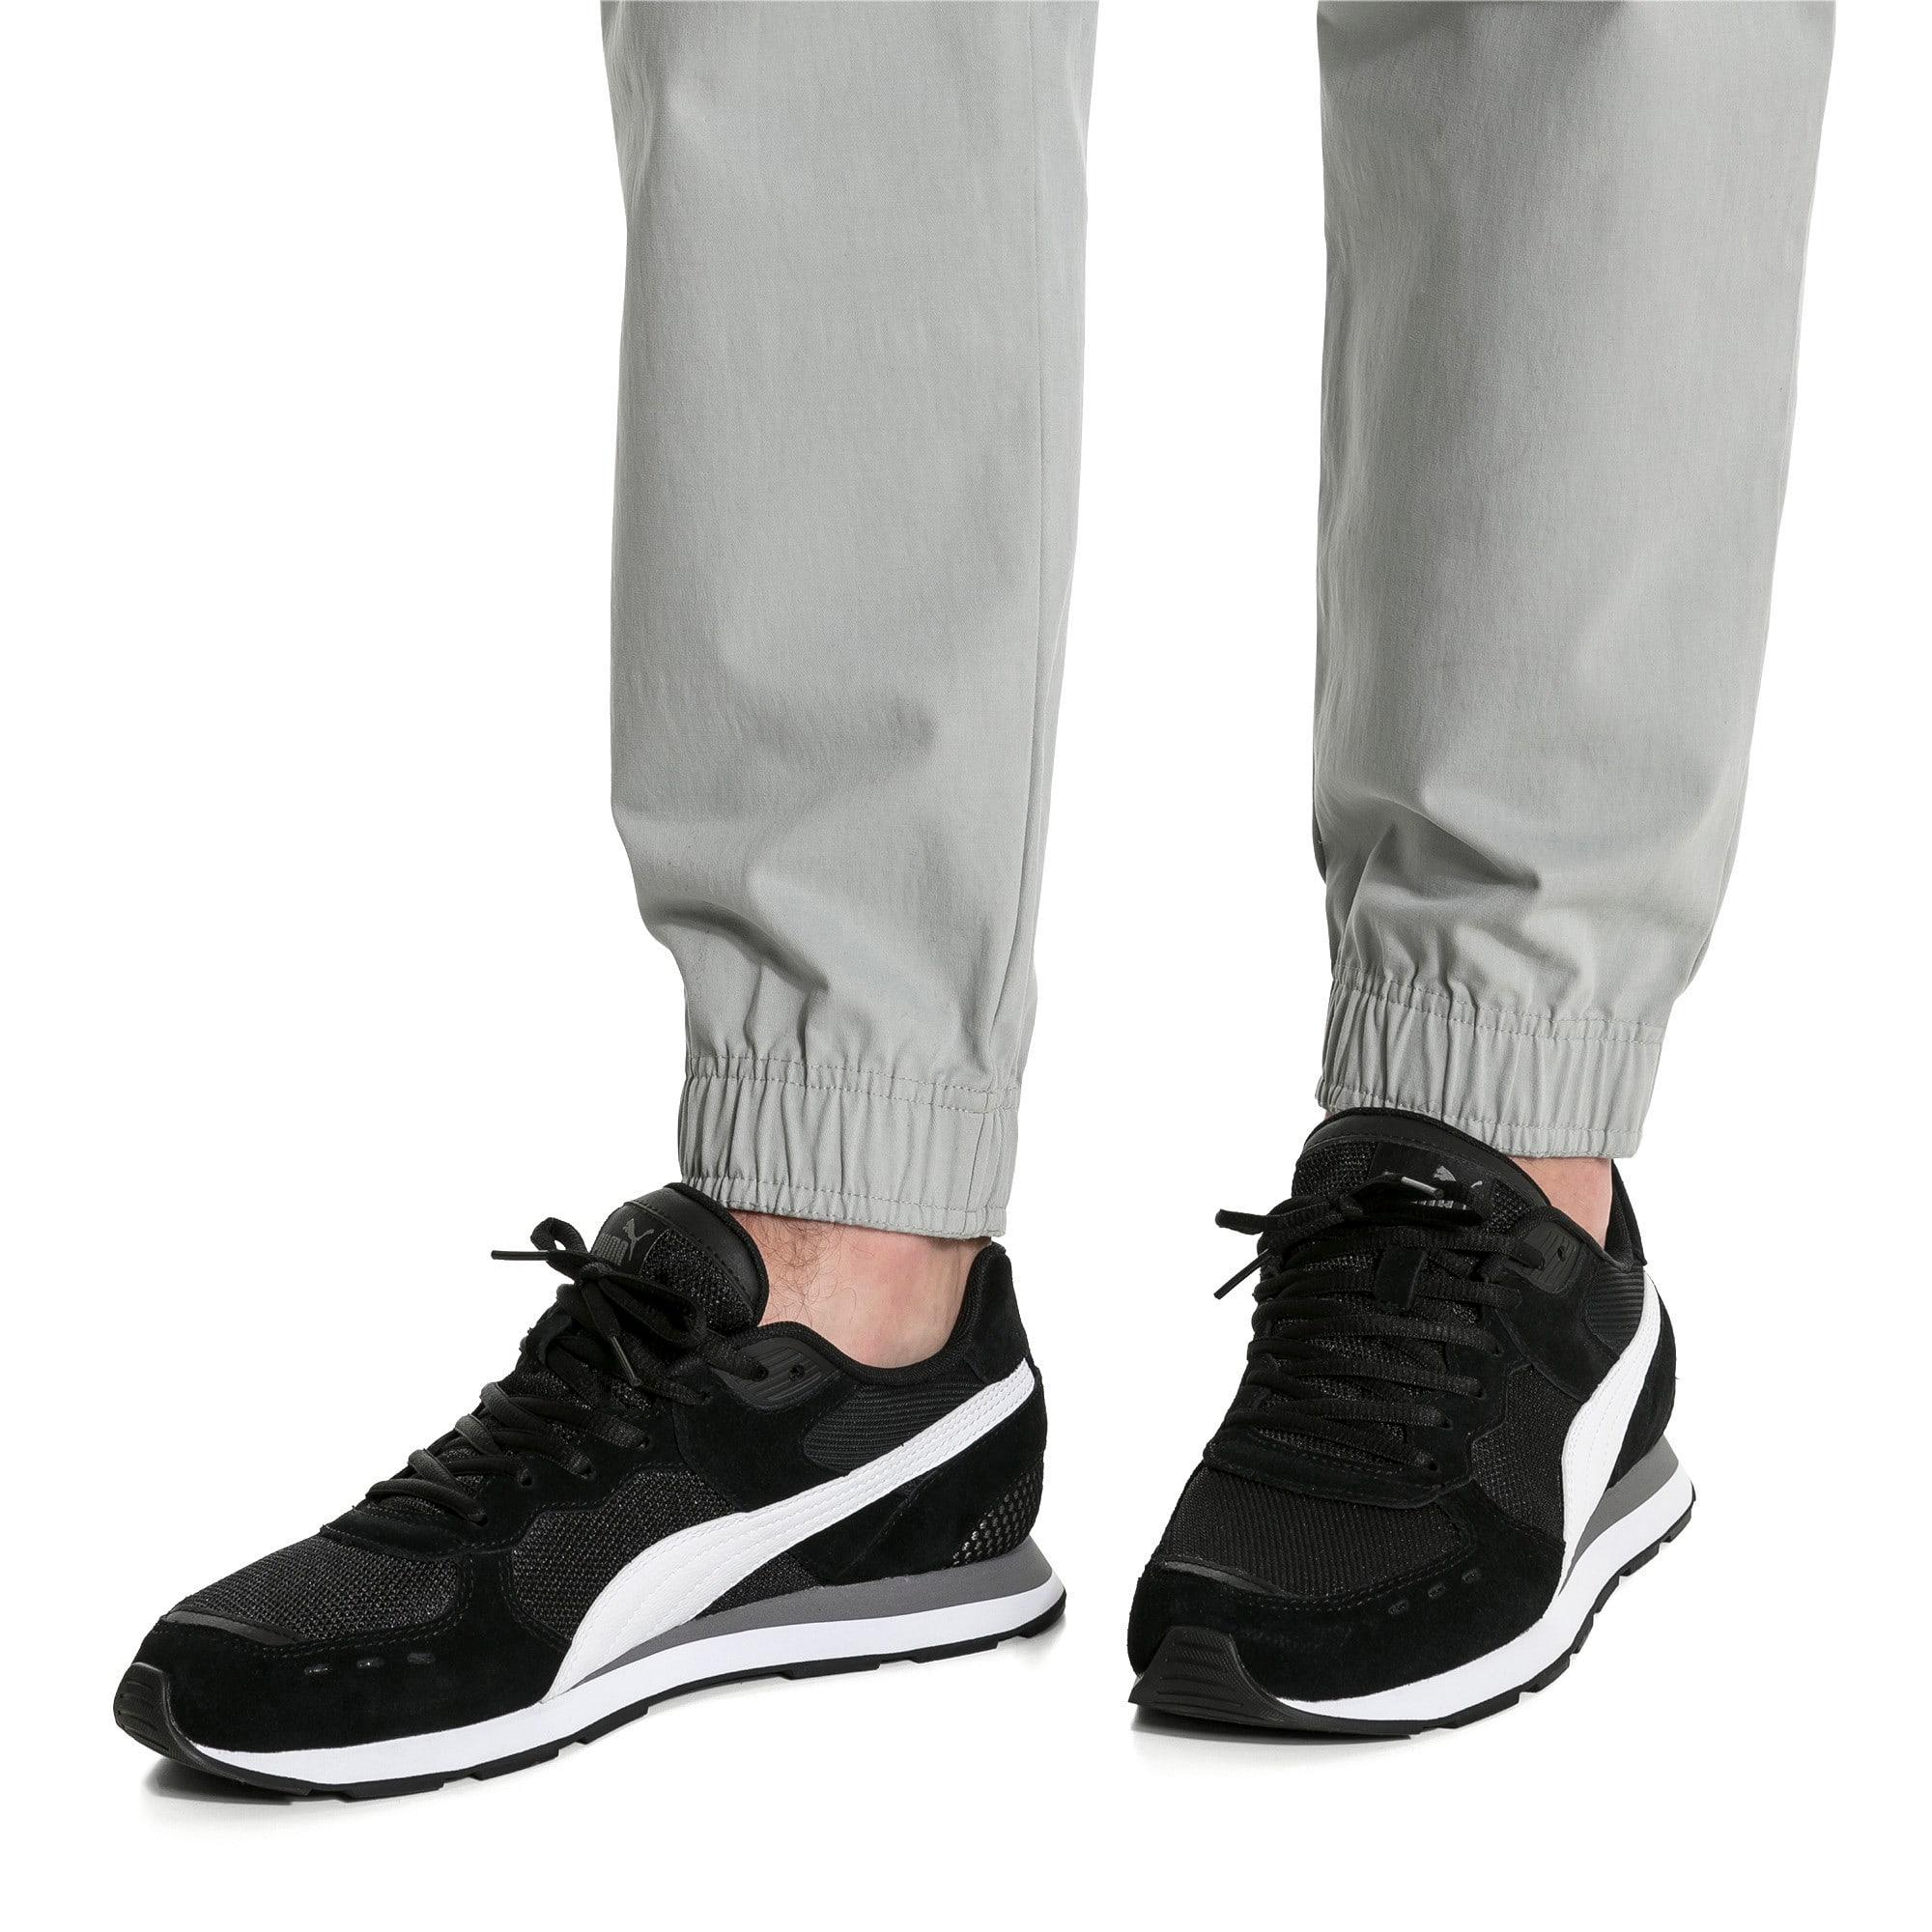 Miniatura 2 de Zapatos deportivos Vista, Black-White-Charcoal Gray, mediano